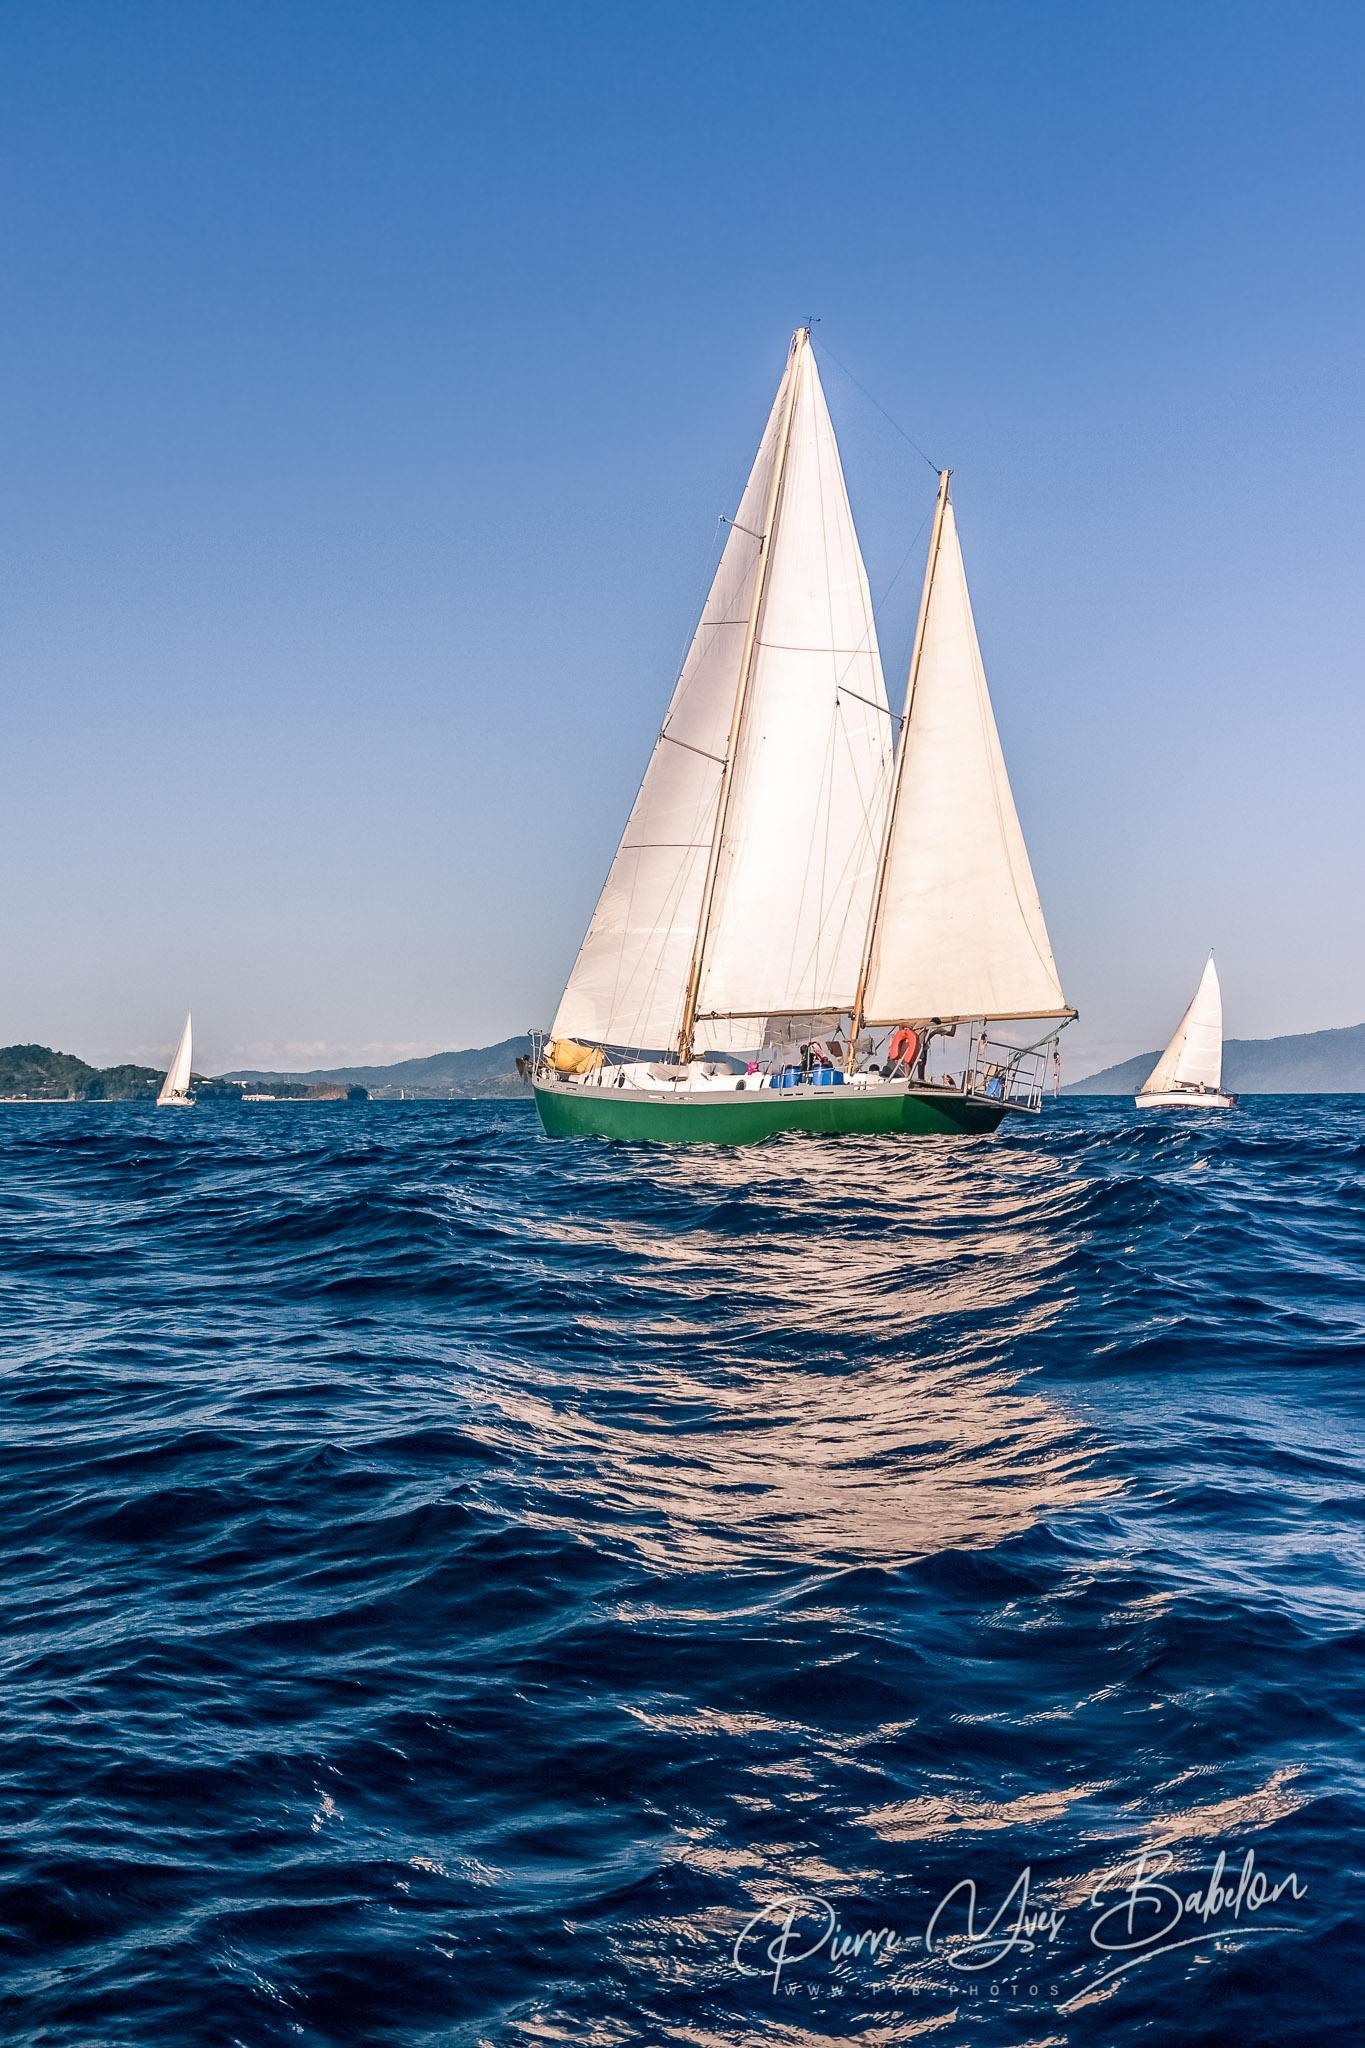 Sailboats race